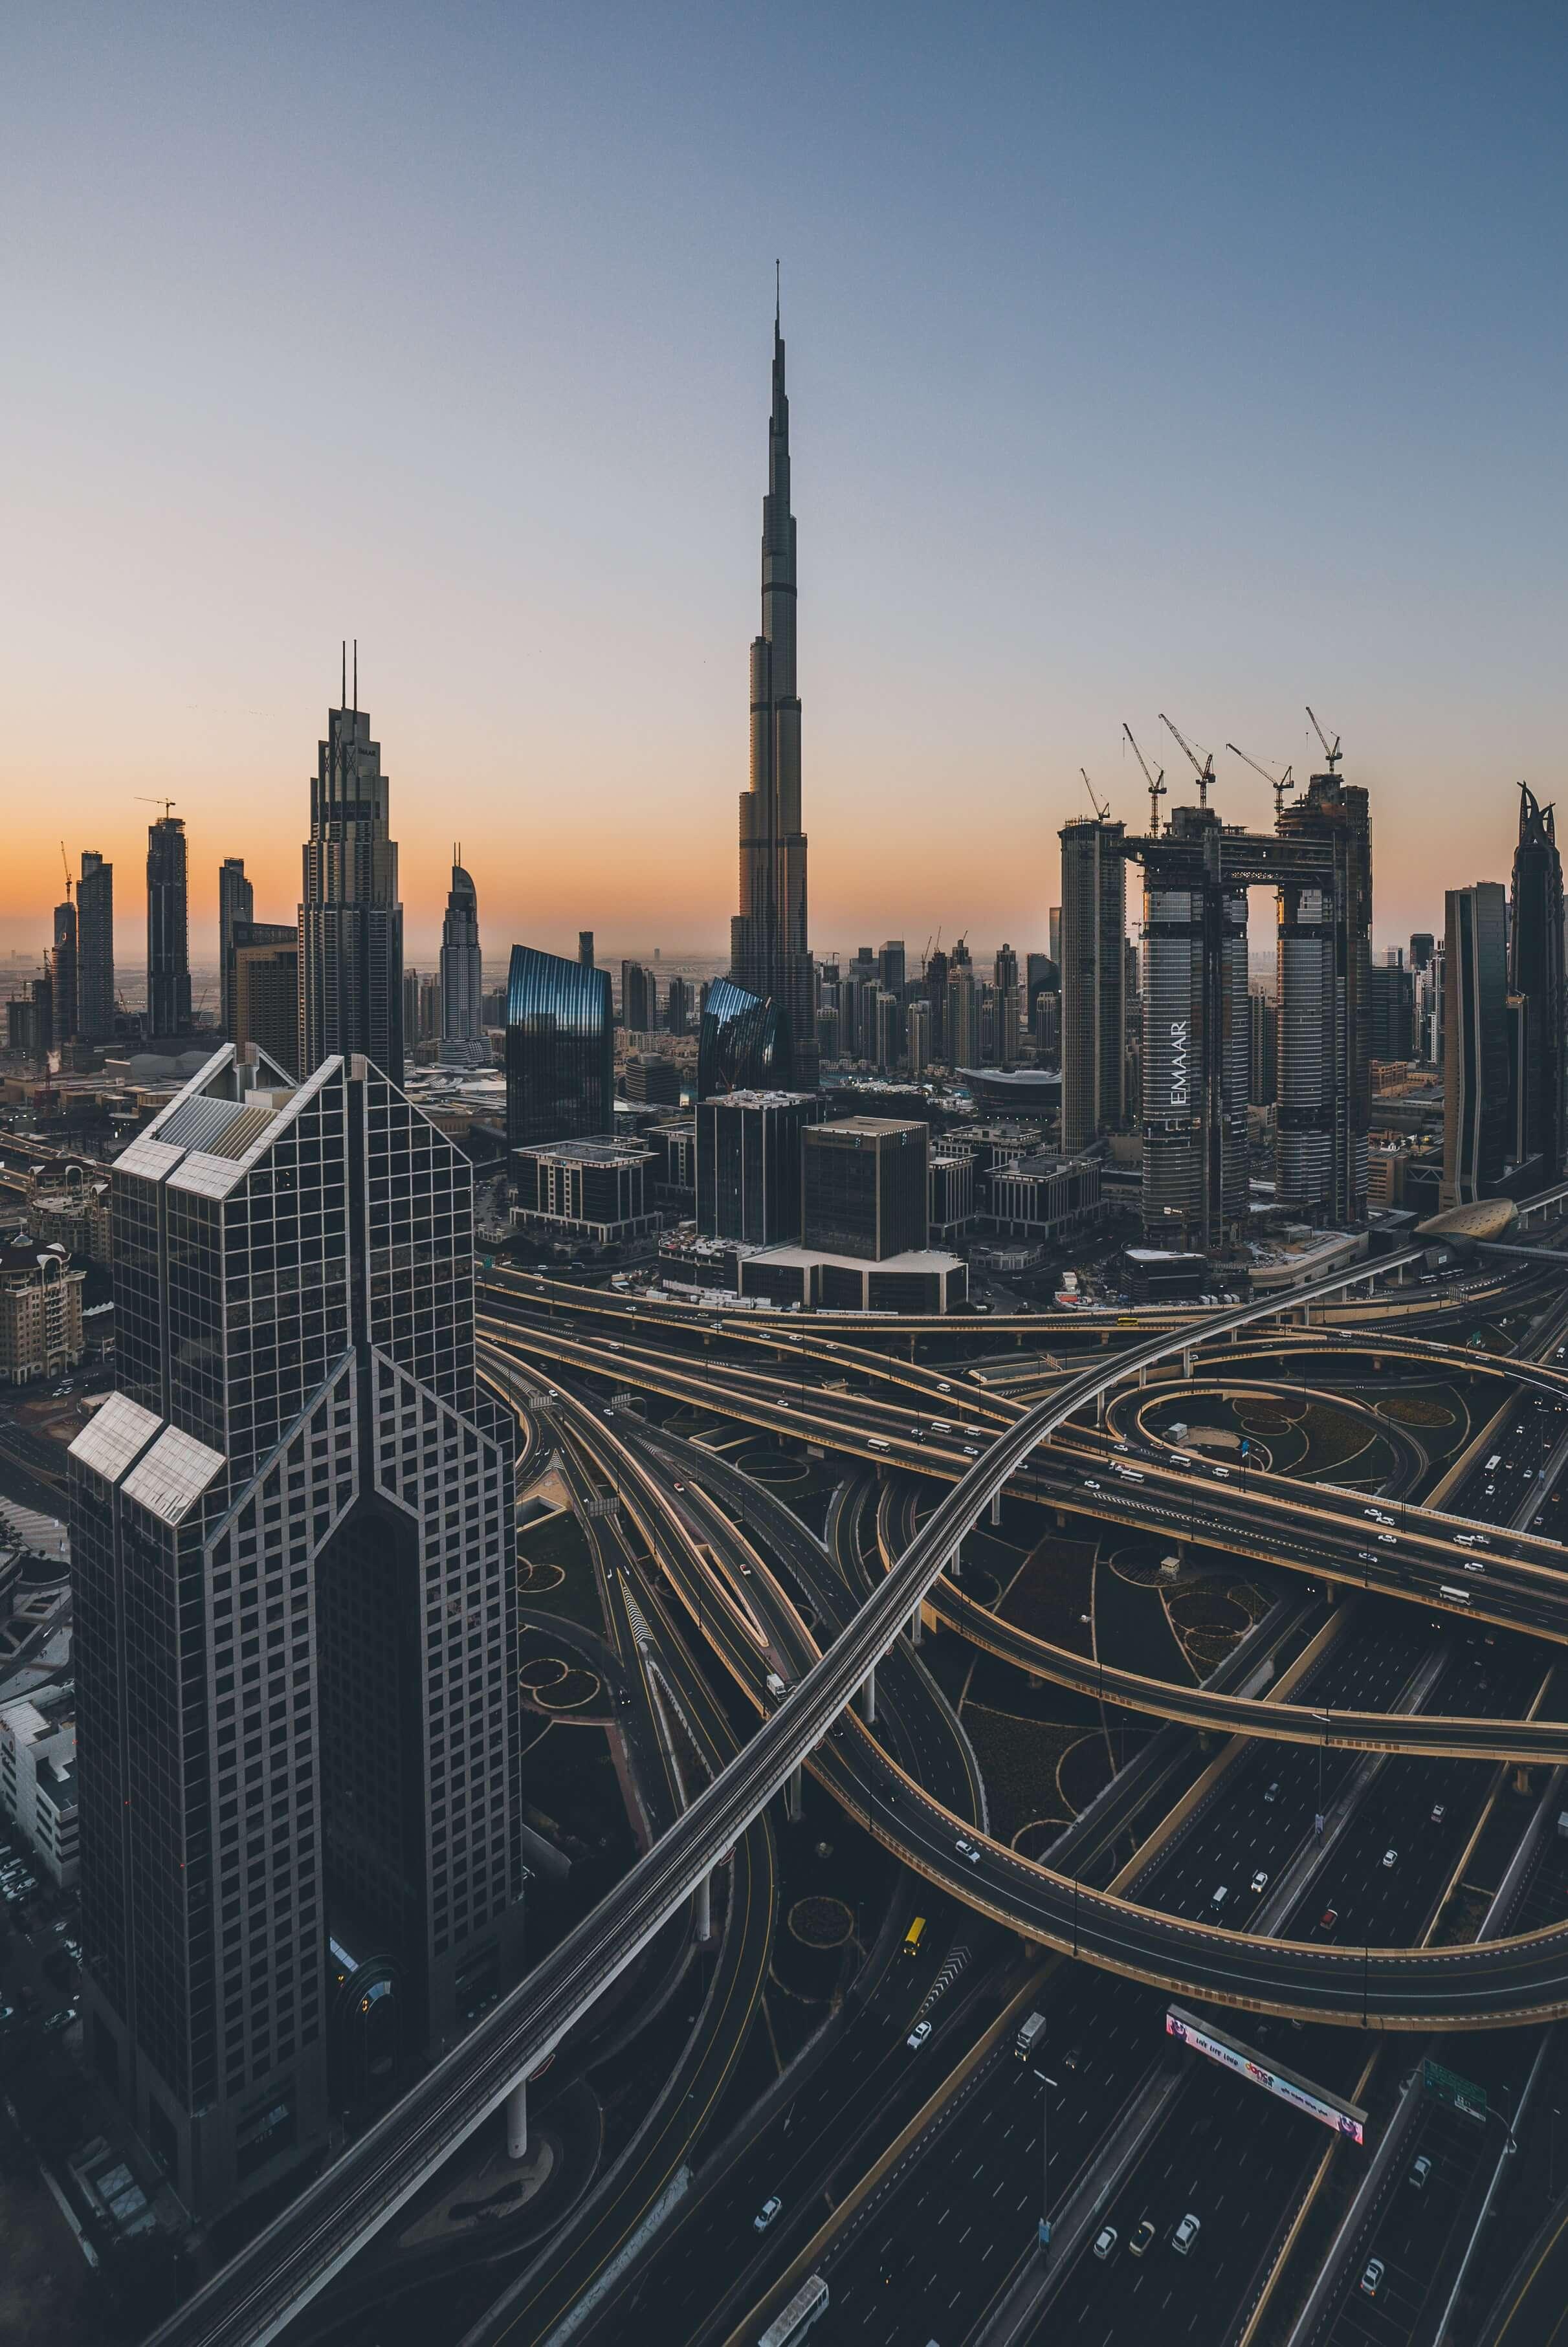 UAE skyline and roads